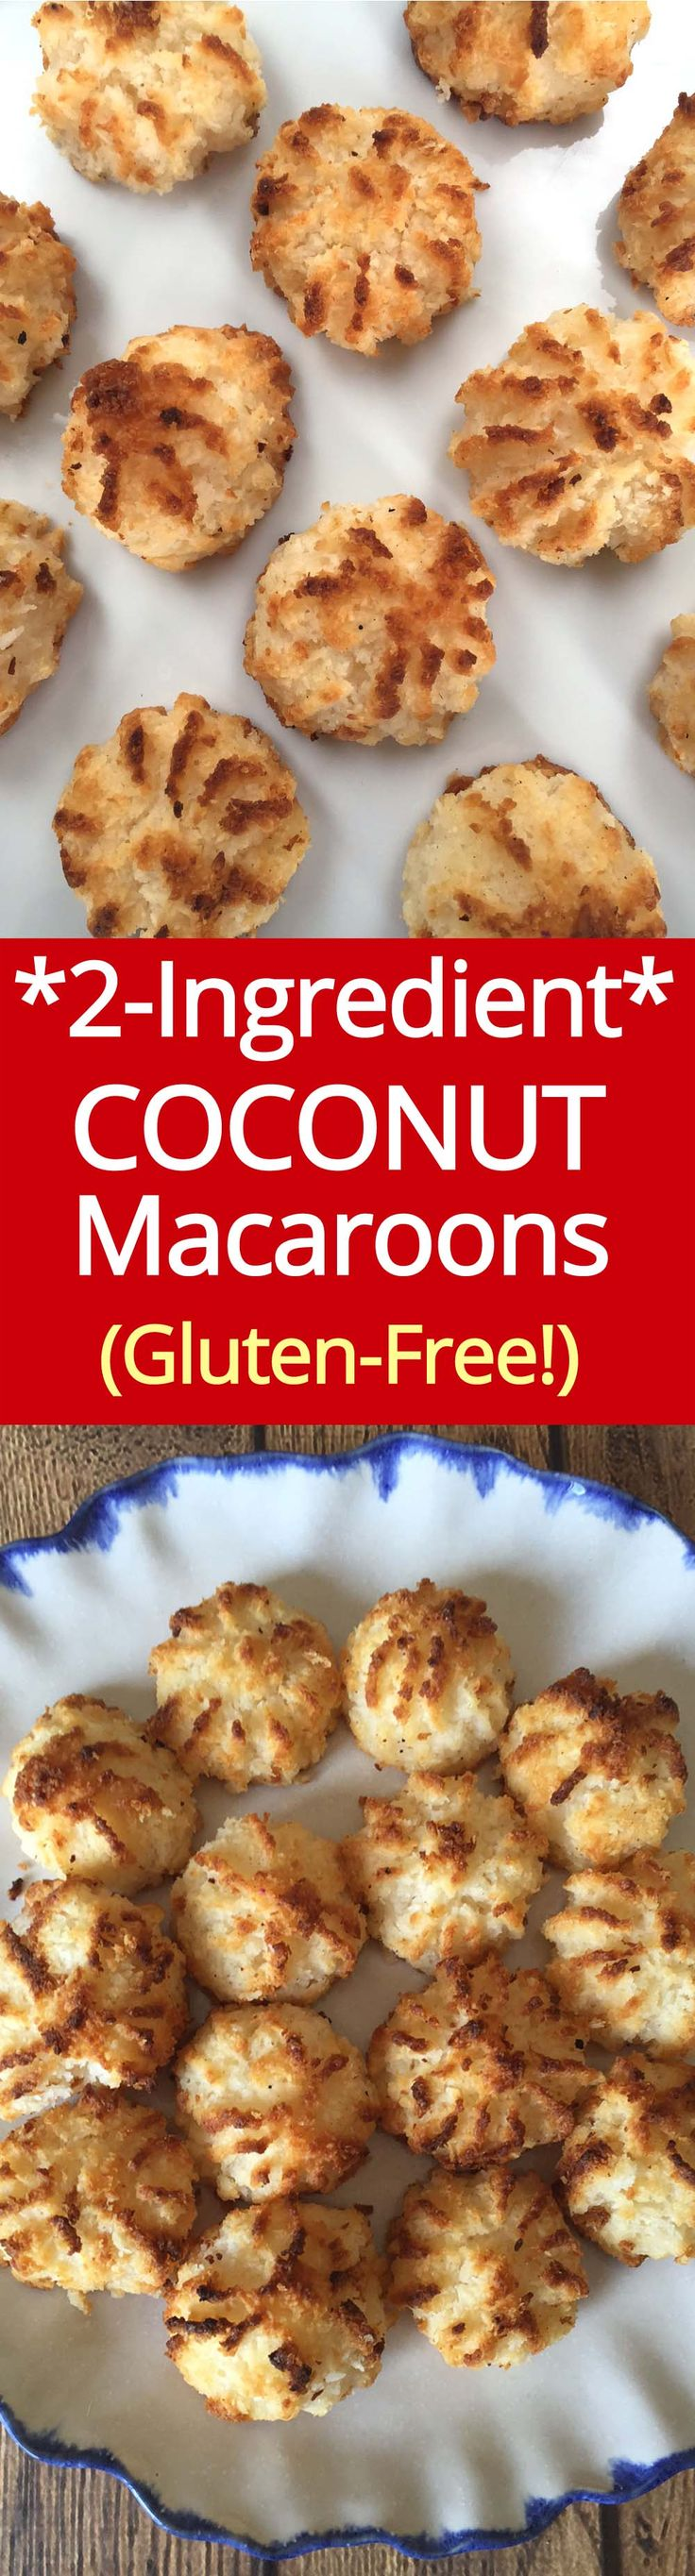 2-Ingredient Coconut Macaroons - amazing gluten-free cookies from MelanieCooks.com! #glutenfree #coconut #macaroons